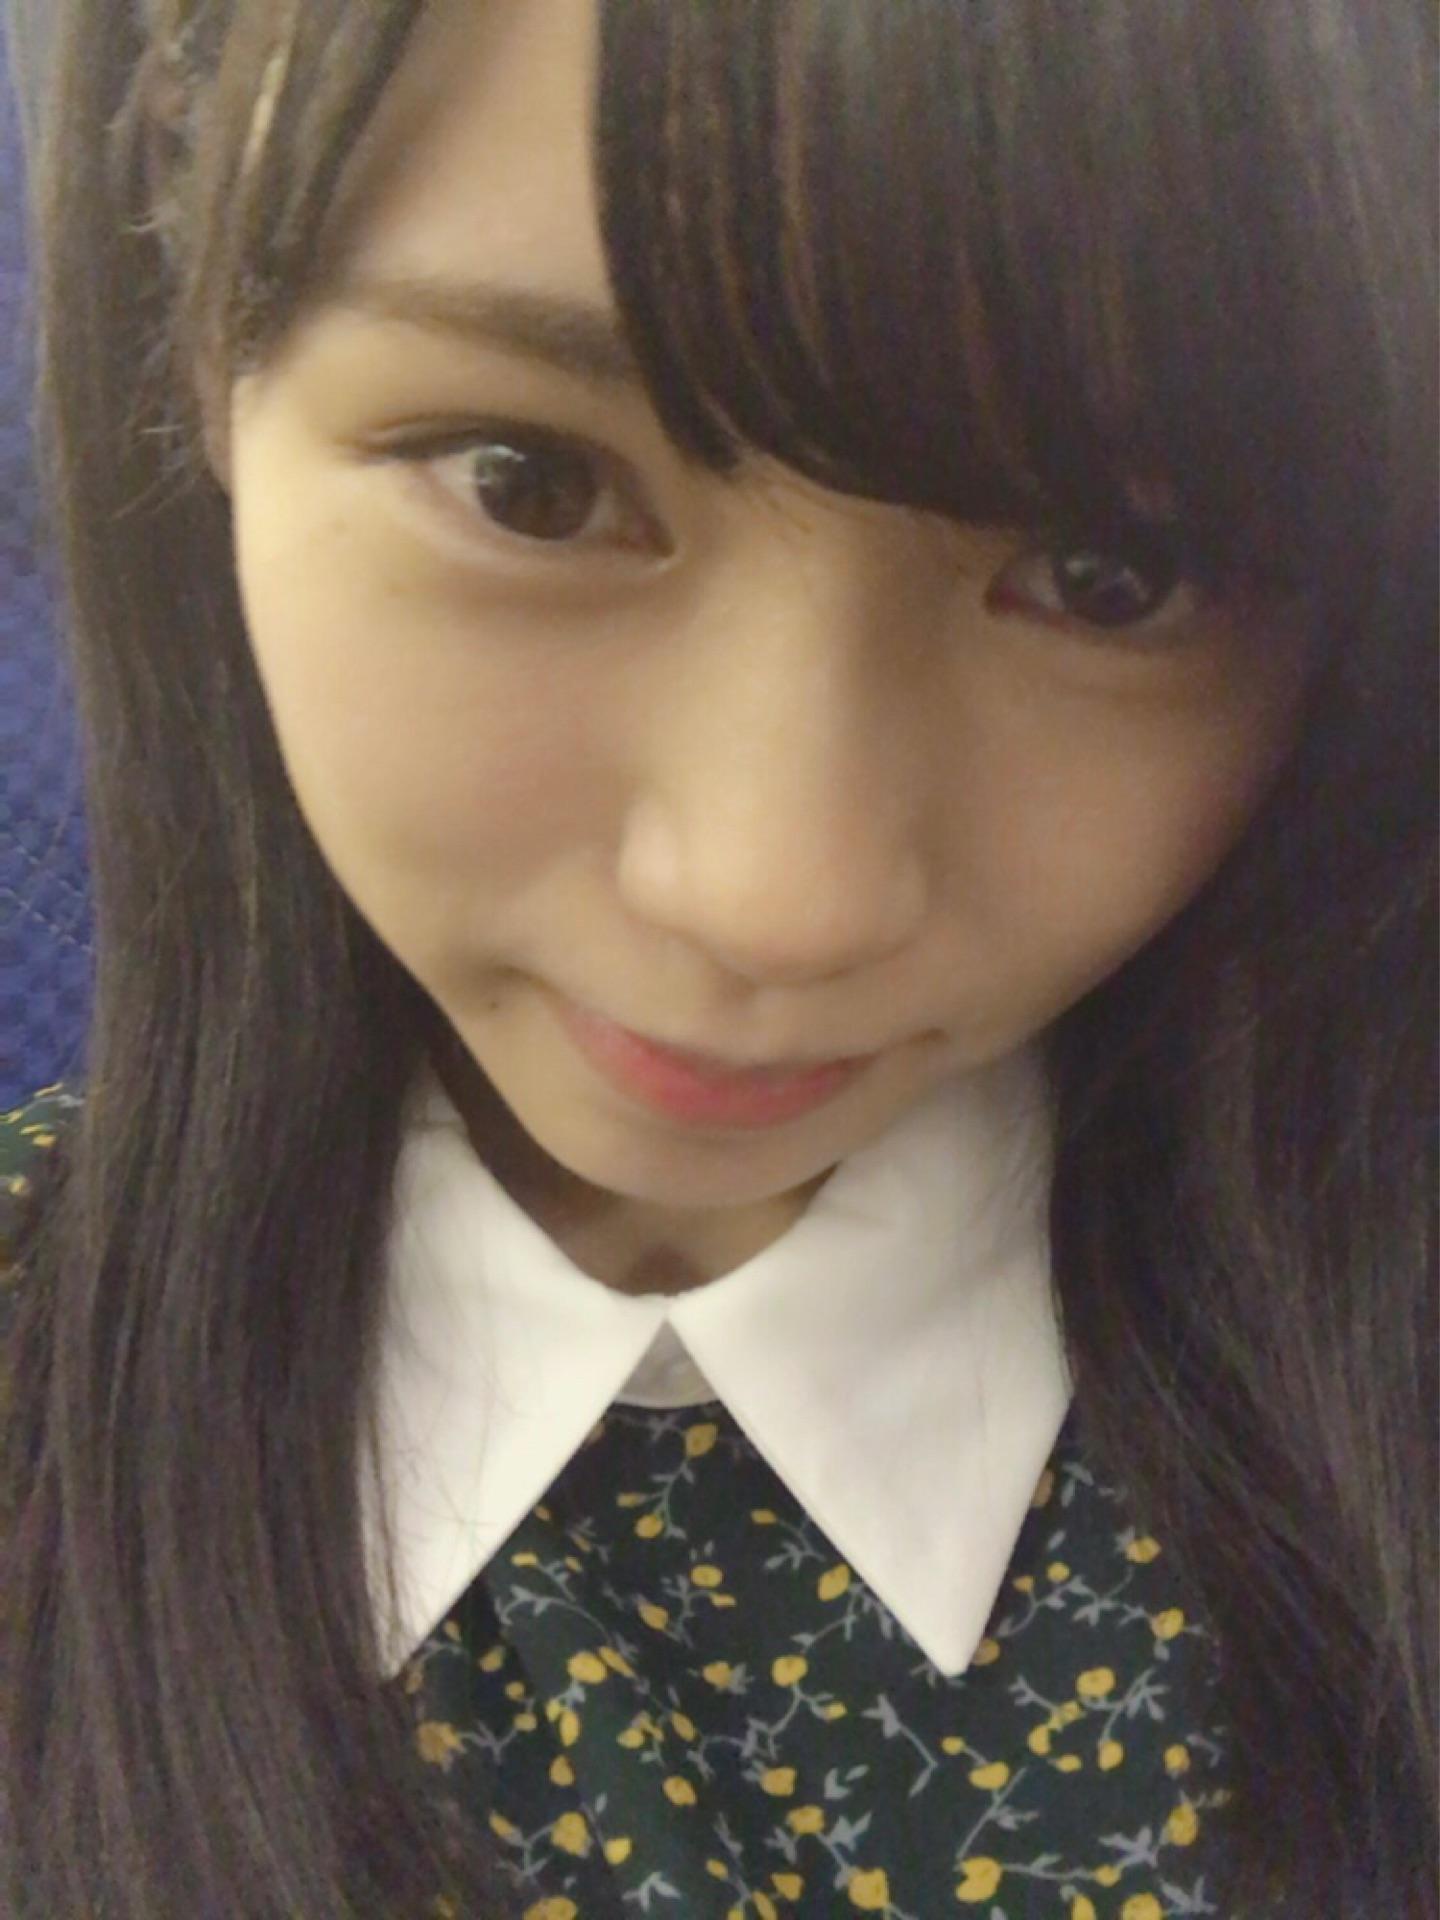 【HKT48】運上弘菜ちゃん応援スレ☆48【なっぴ/チームKIV】YouTube動画>22本 ->画像>131枚